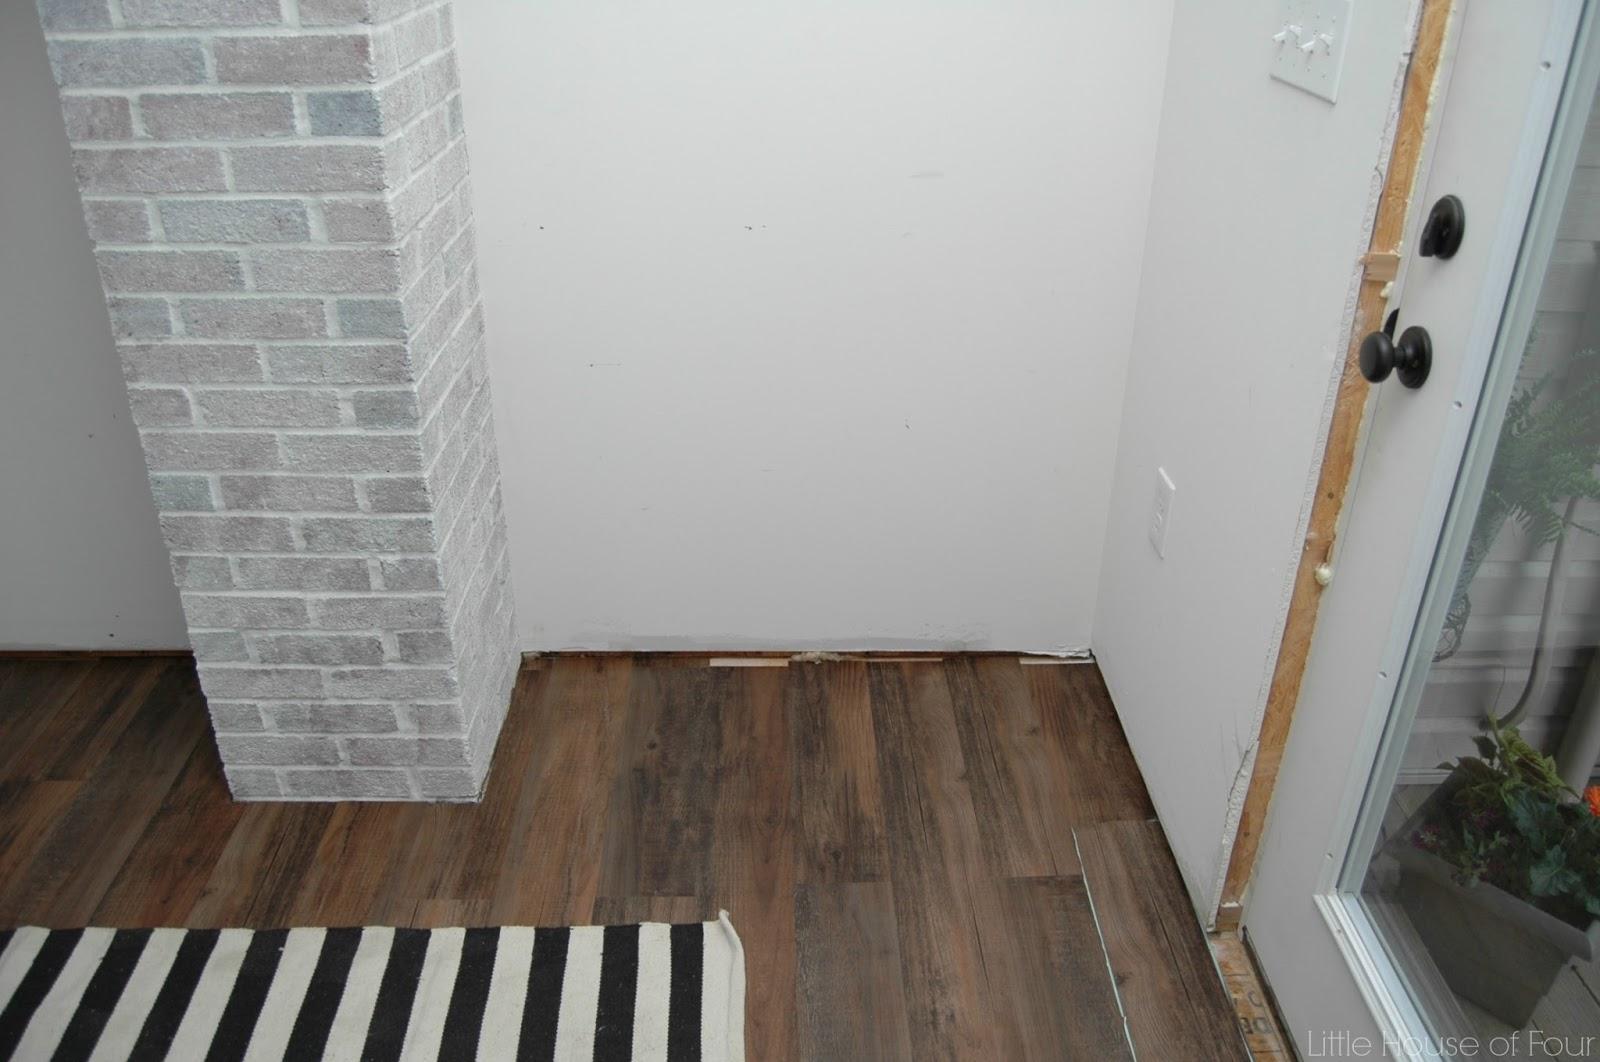 How To Lay Vinyl Flooring >> {Mudroom Progress} Installing Vinyl Plank Flooring | Little House of Four - Creating a beautiful ...